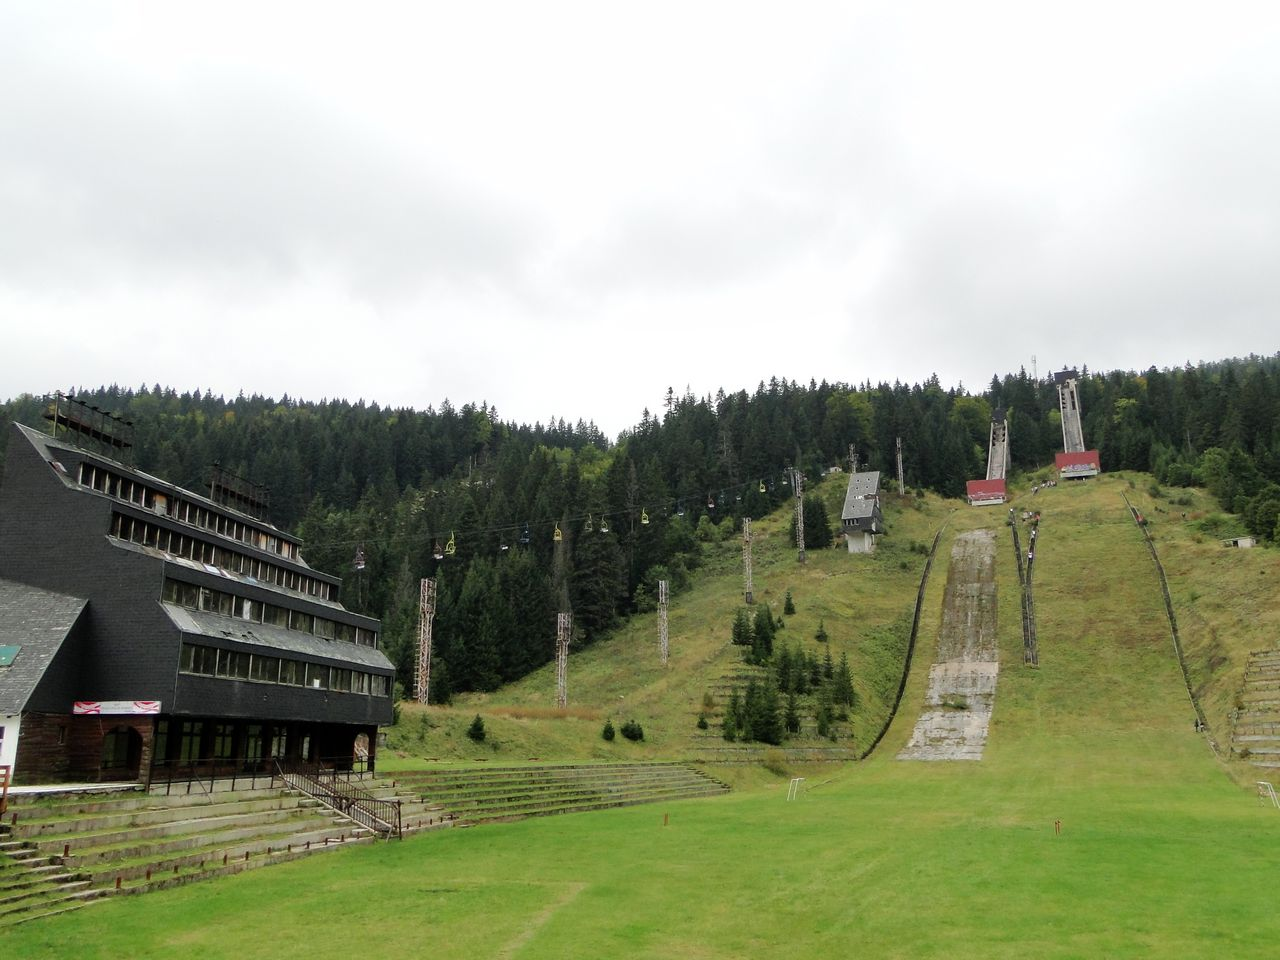 Sarajevo - abandoned places - Olympic Ski Jump